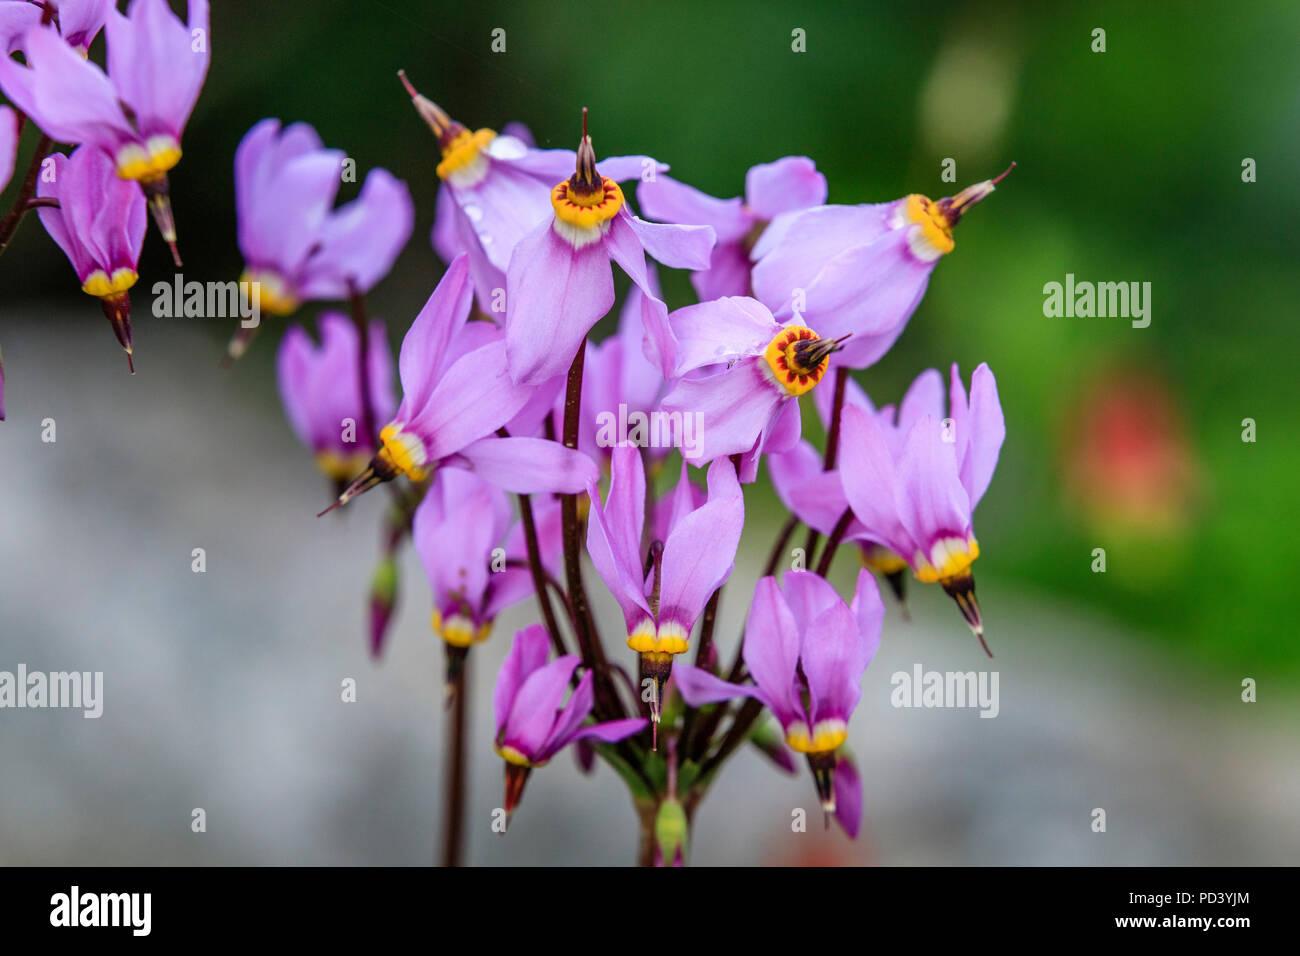 France, Hautes Alpes, Villar d'Arene, Alpine botanical garden of Lautaret,  shooting star (Dodecatheon meadia) - Stock Image